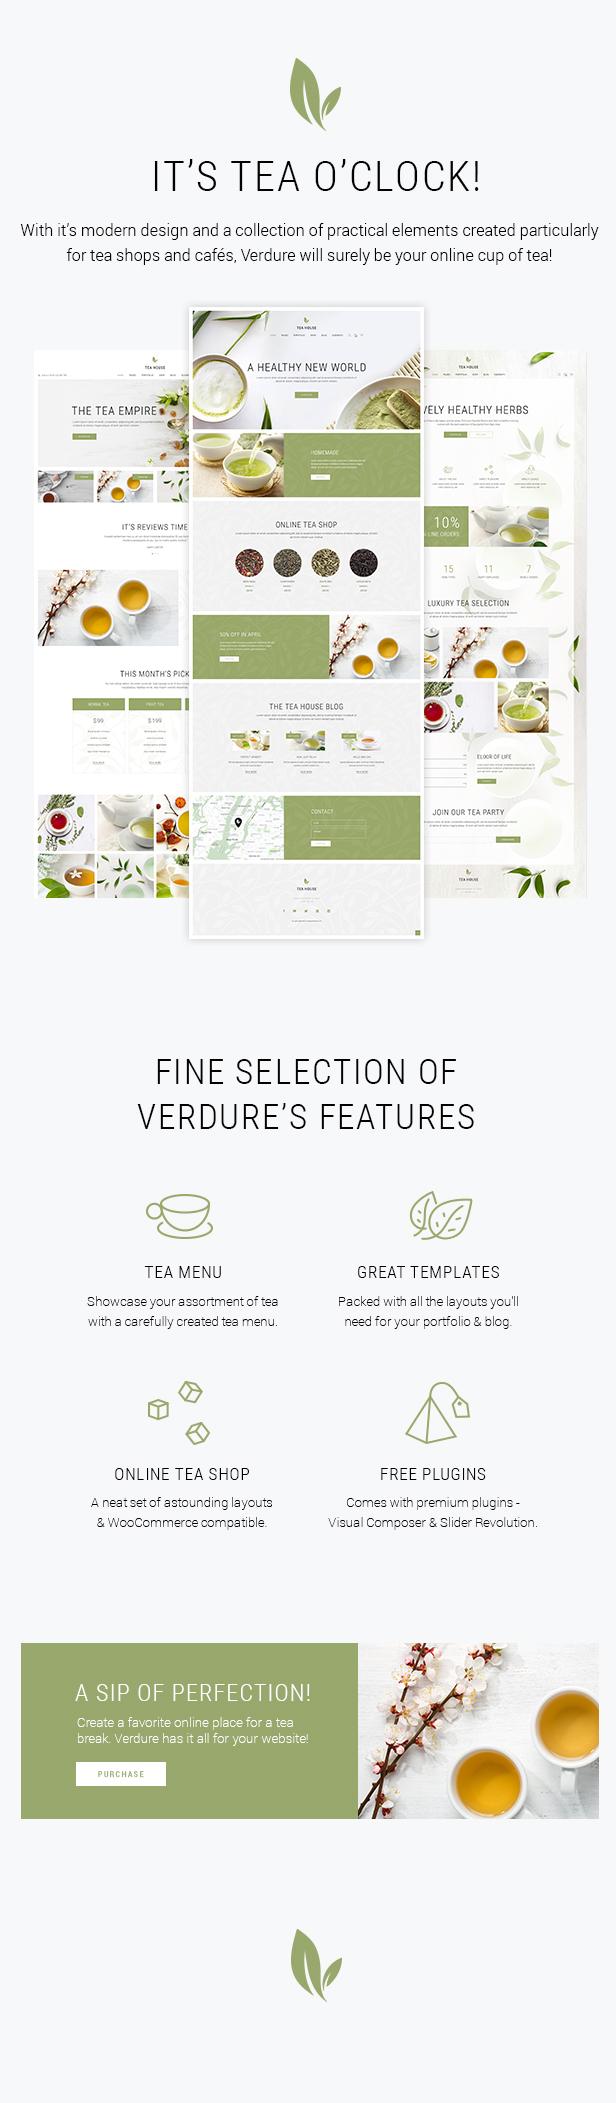 Verdure - Organic Tea Shop Theme by Mikado-Themes | ThemeForest